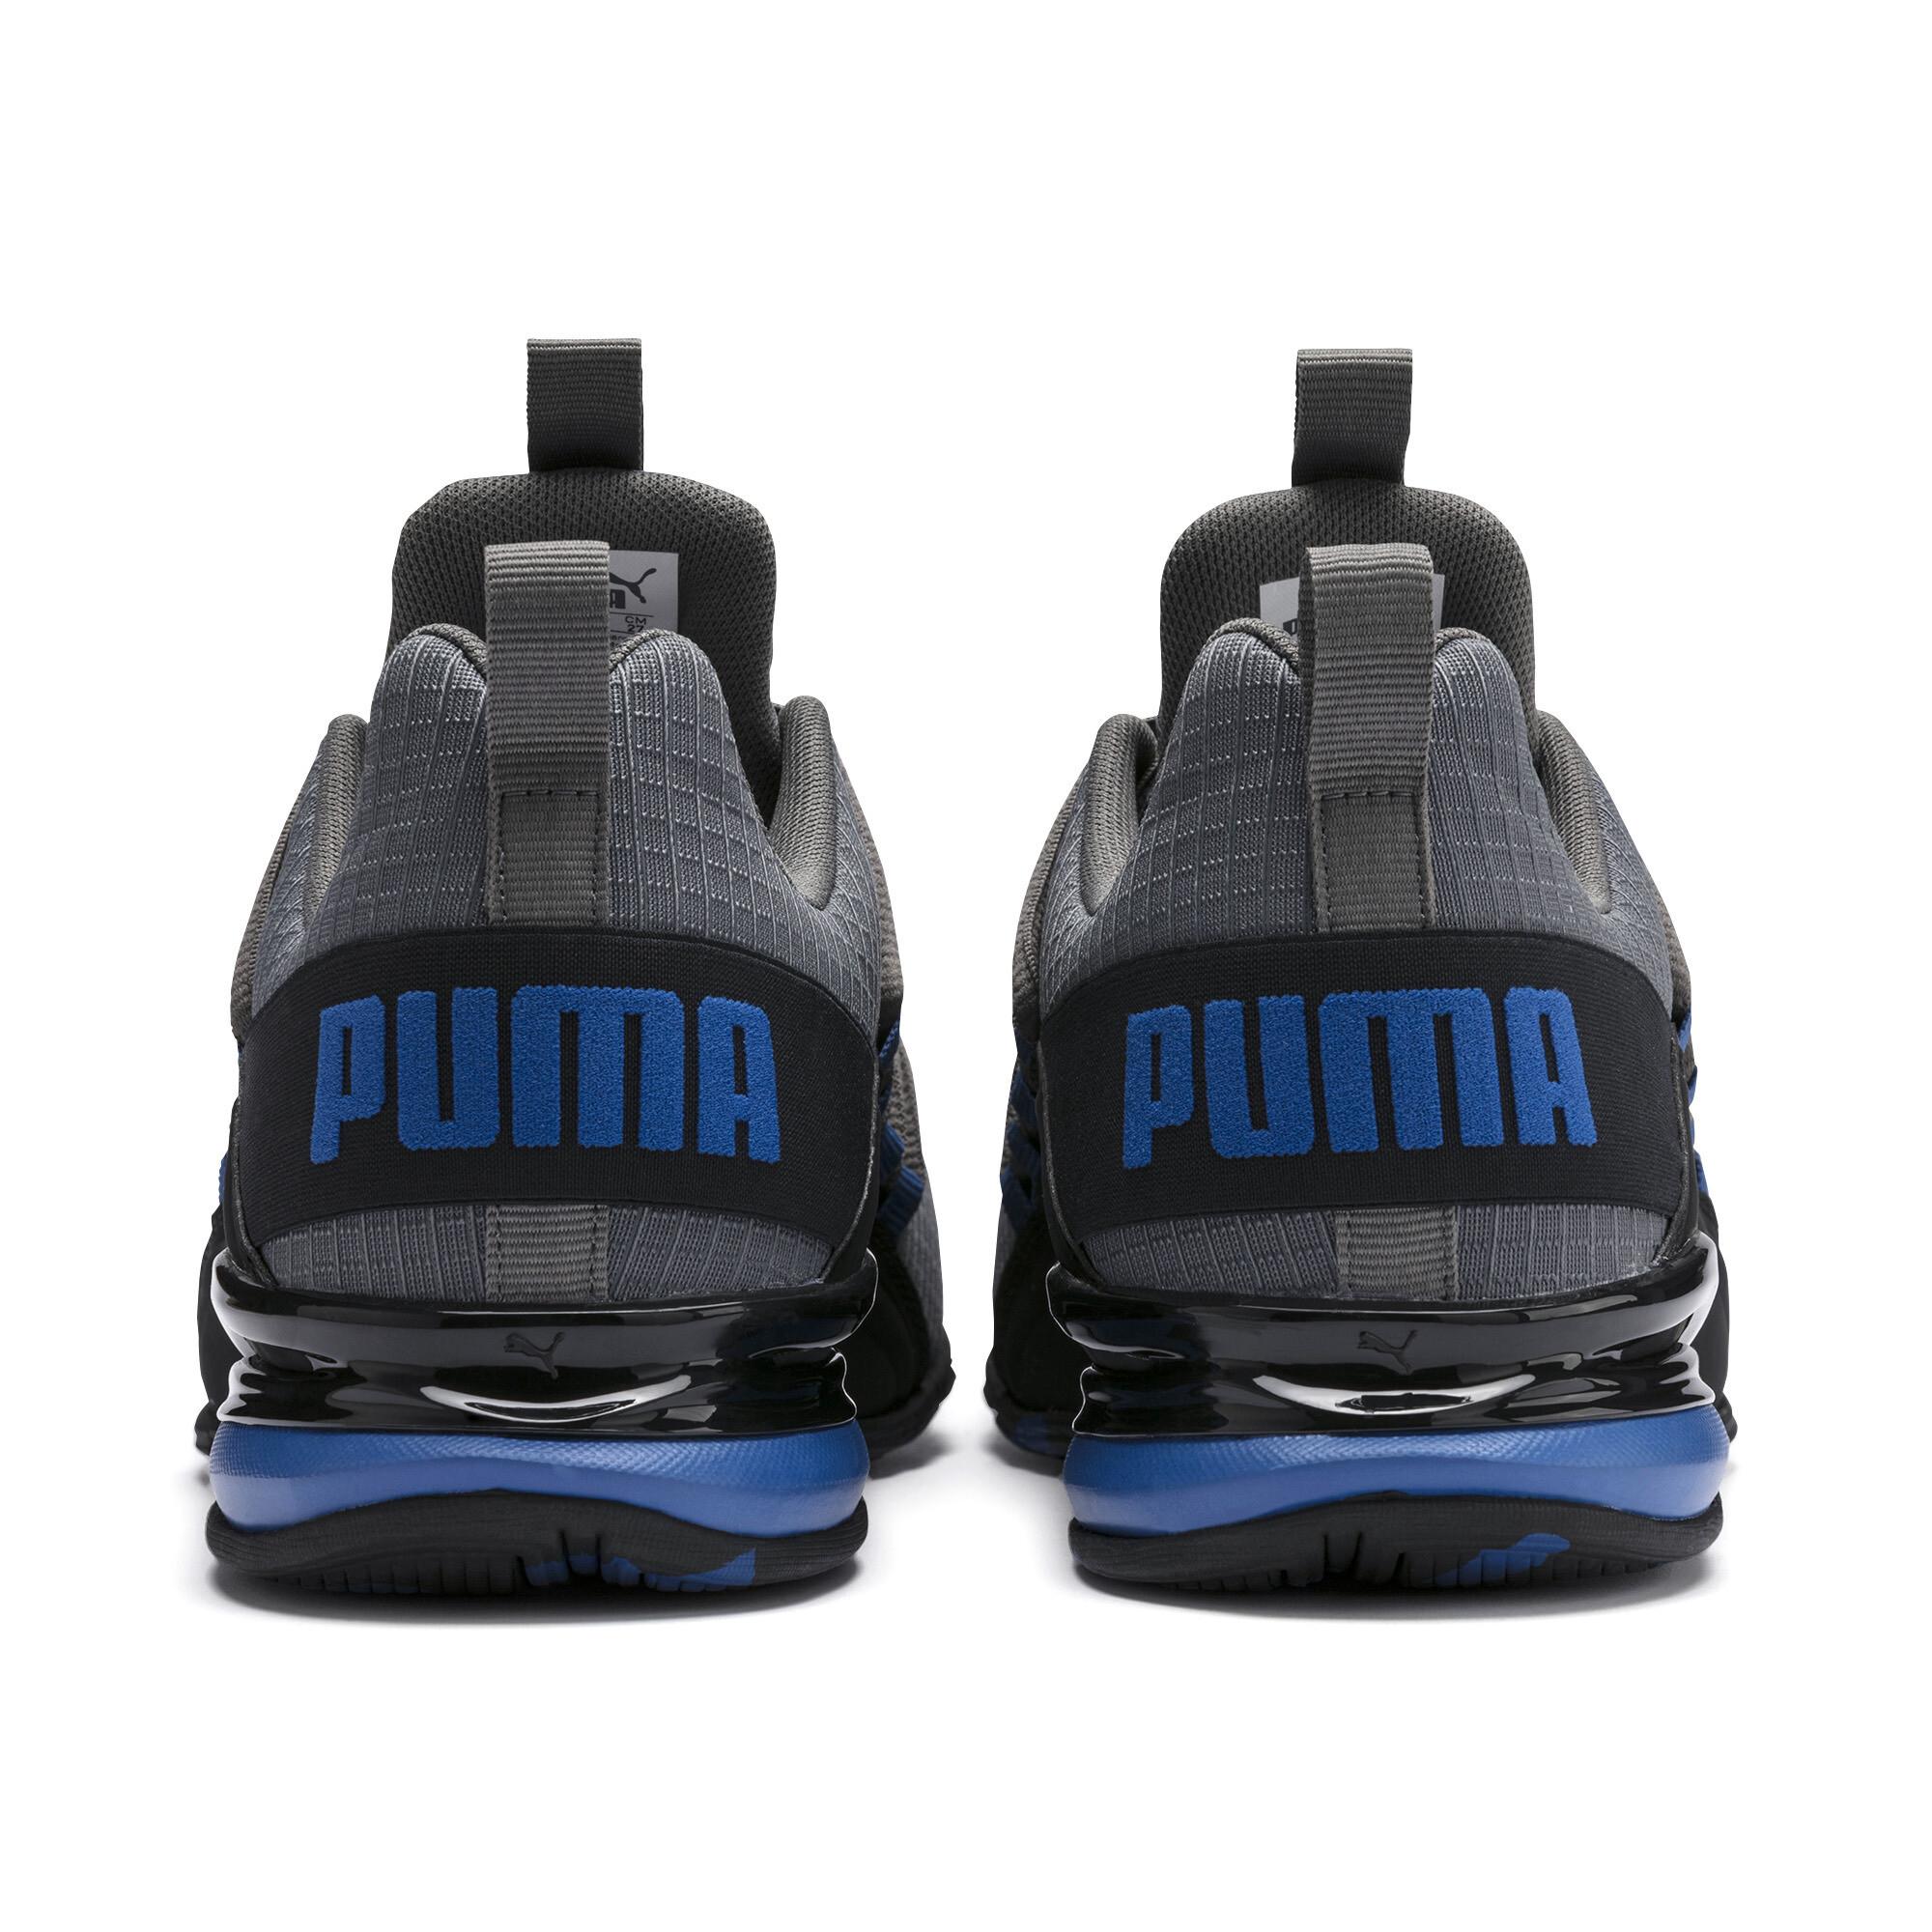 PUMA-Men-039-s-Axelion-Rip-Training-Shoes thumbnail 17